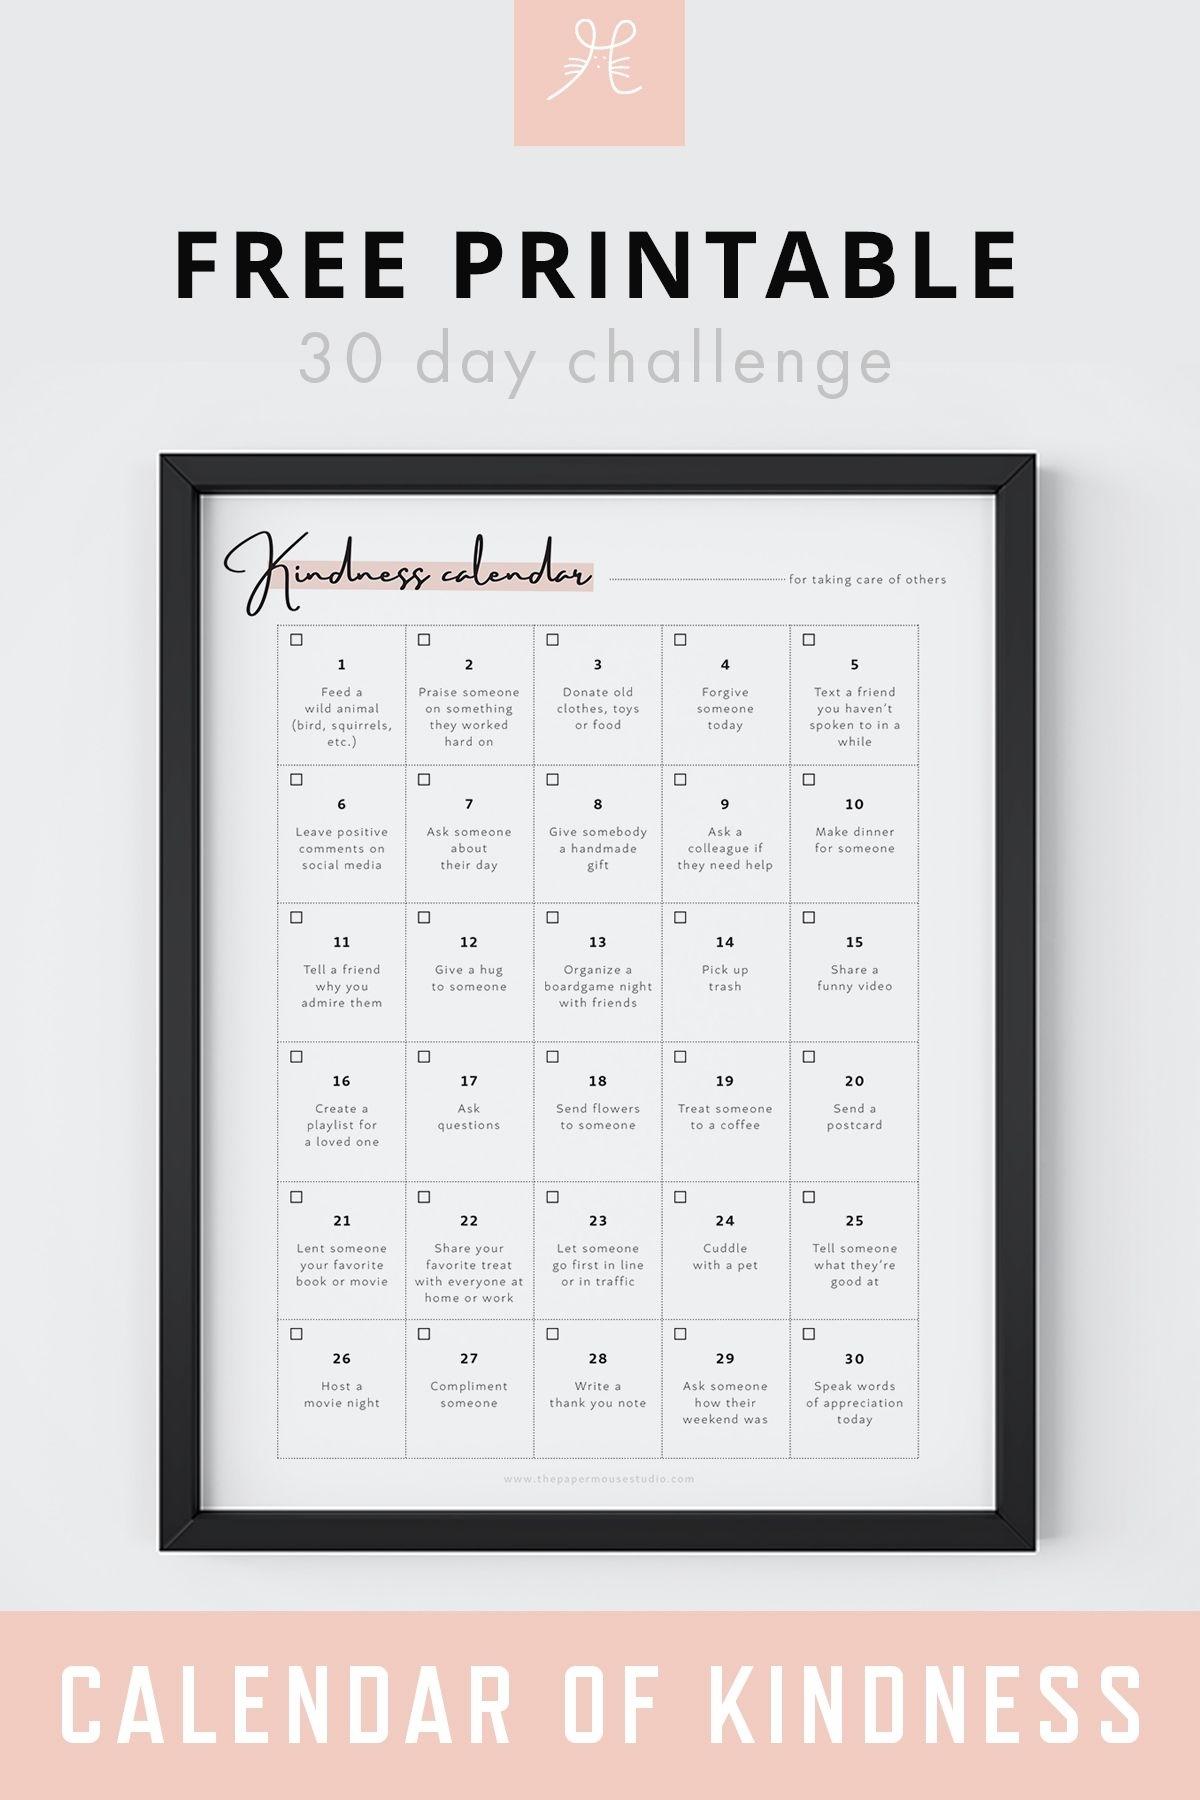 Free Printable 30 Day Challenge Calendar Of Kindness